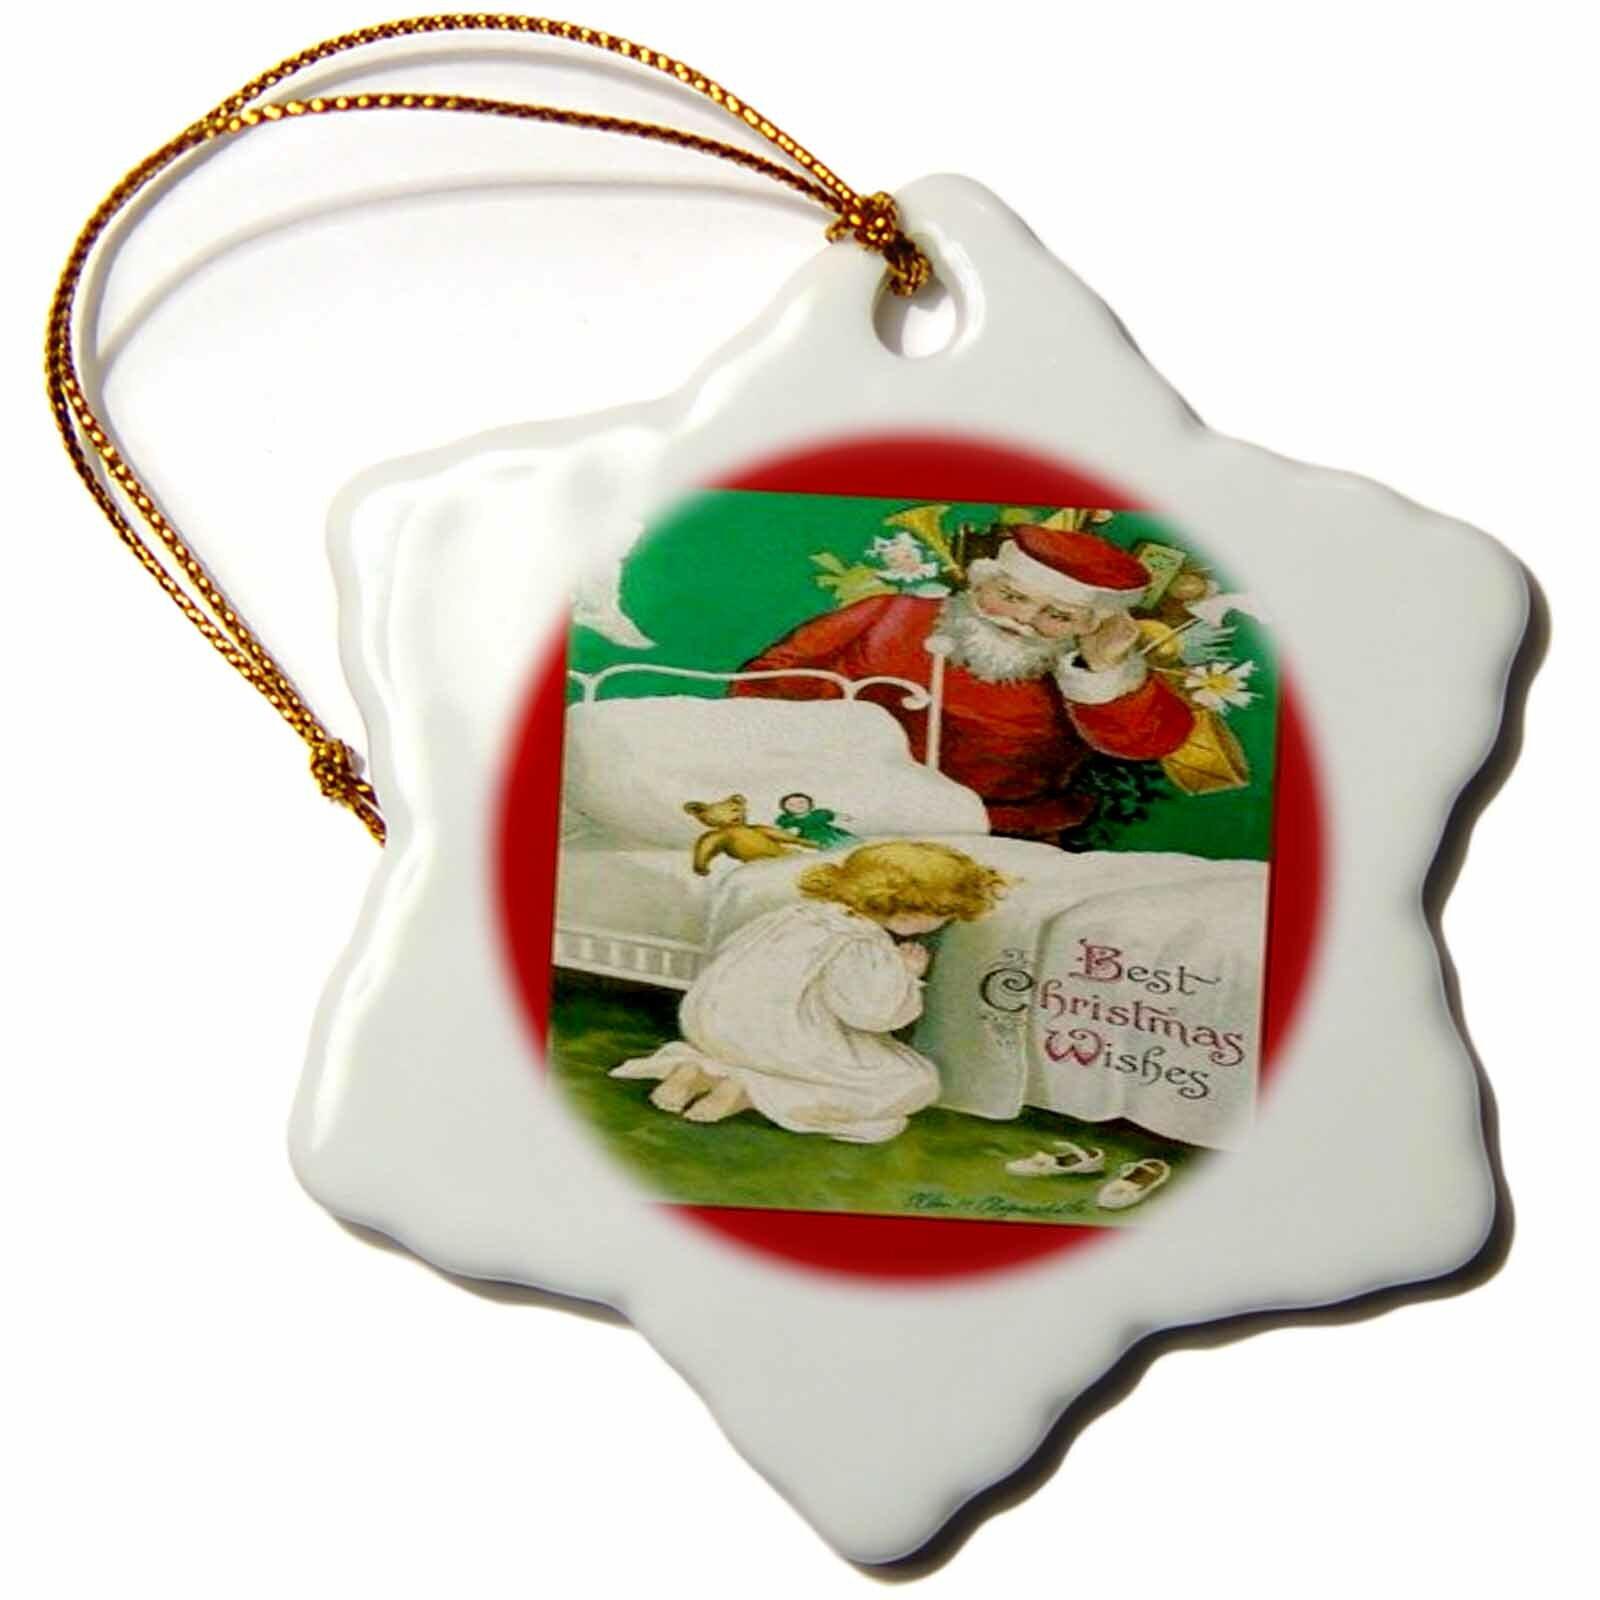 Santas Christmas Prayer Ornament